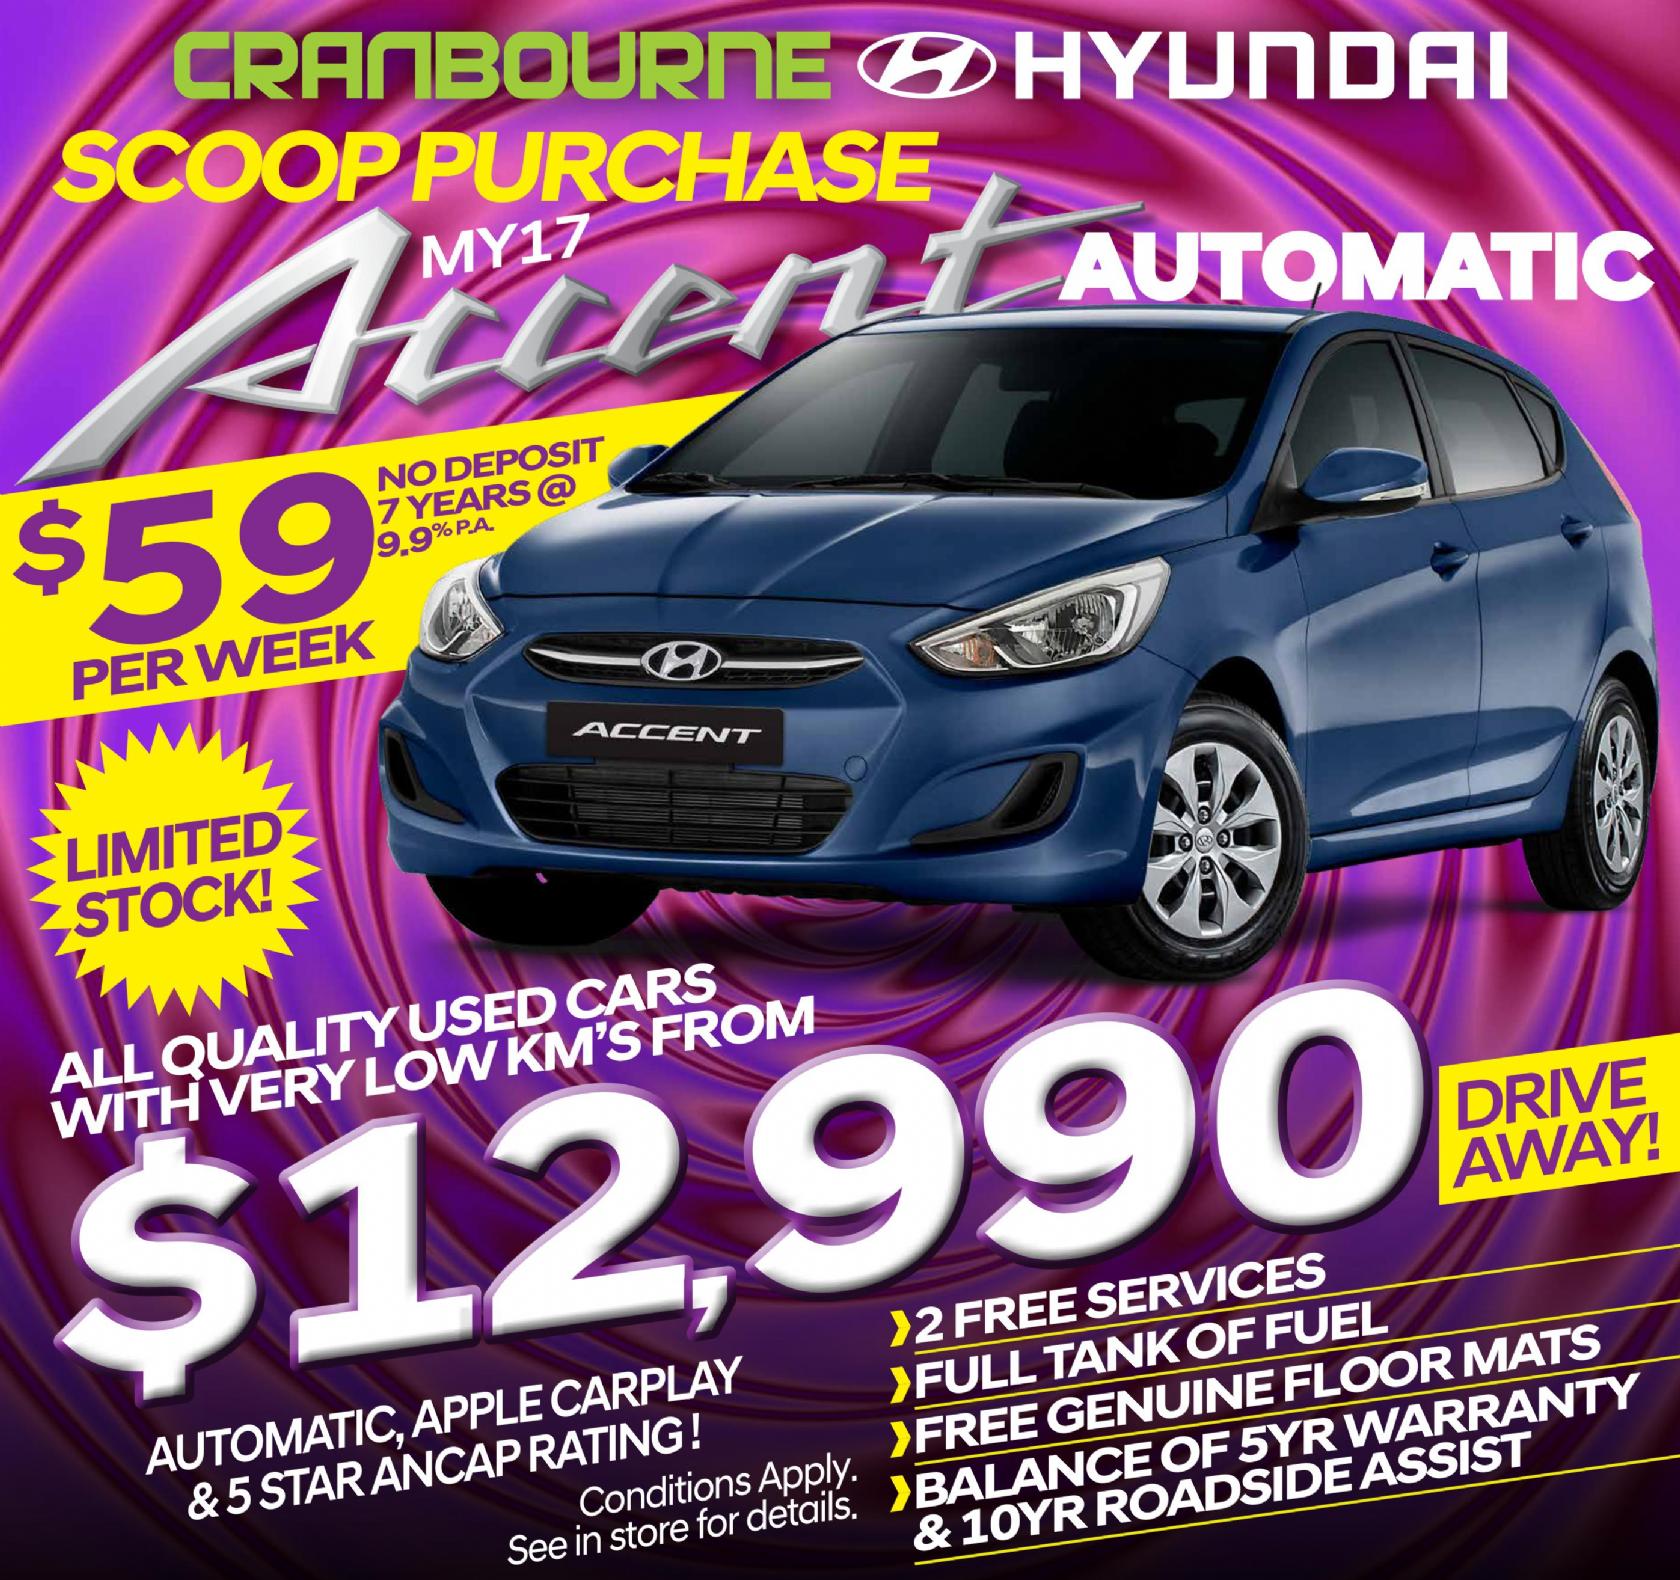 Hyundai Specials - Accent